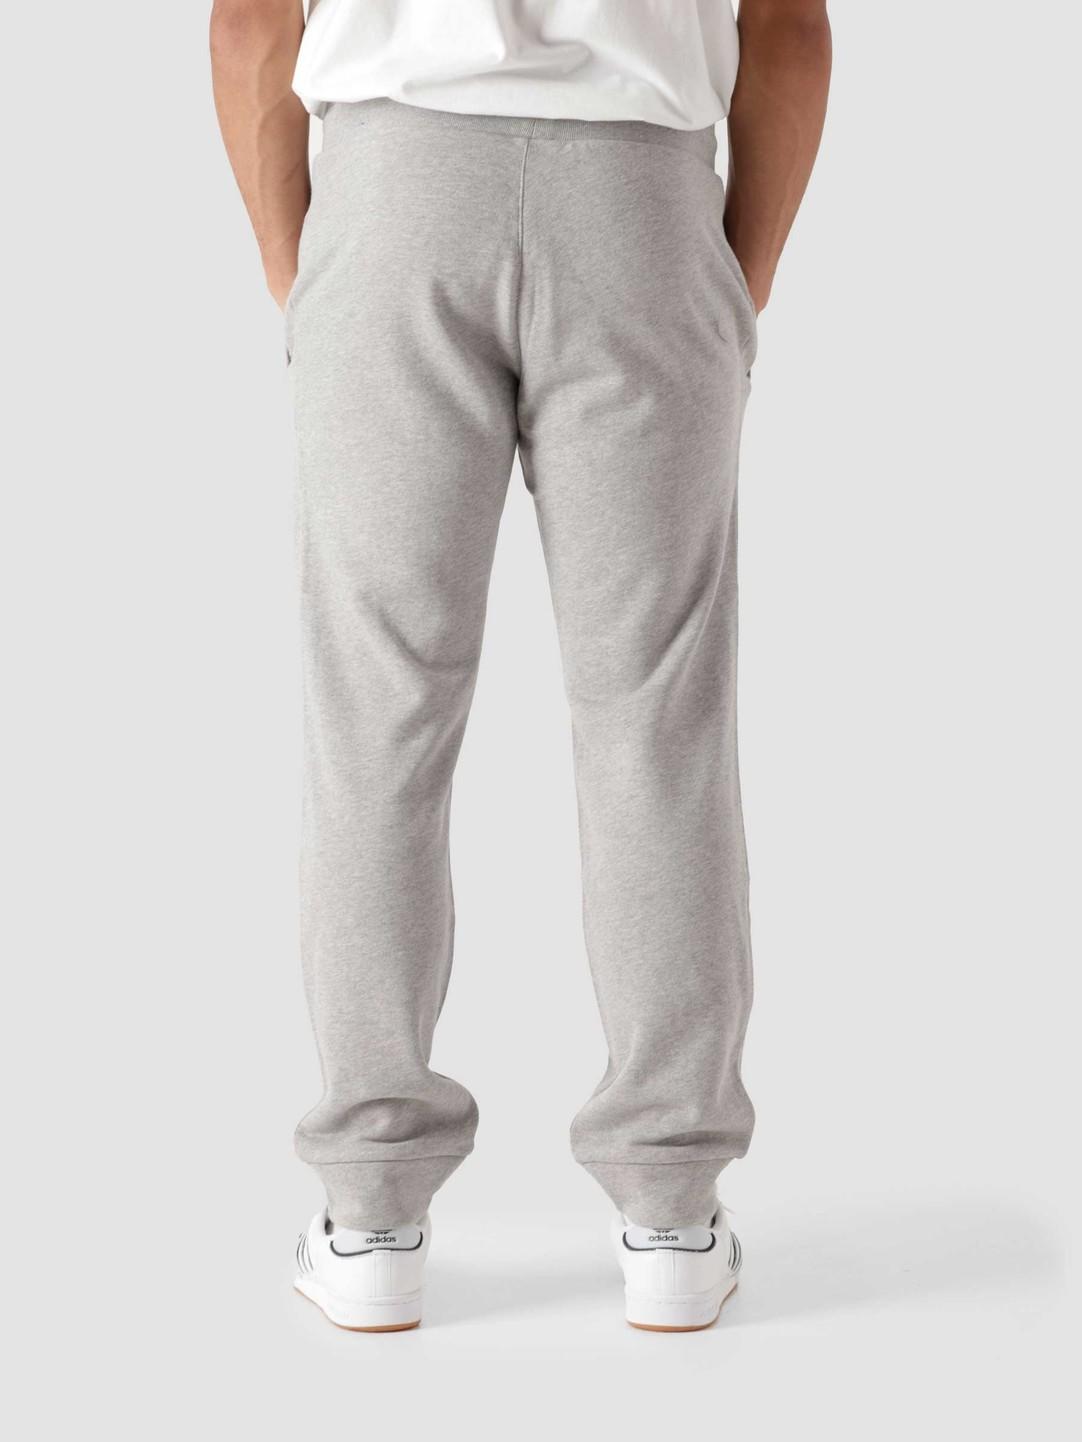 adidas adidas Trefoil Pant Grey DV1540